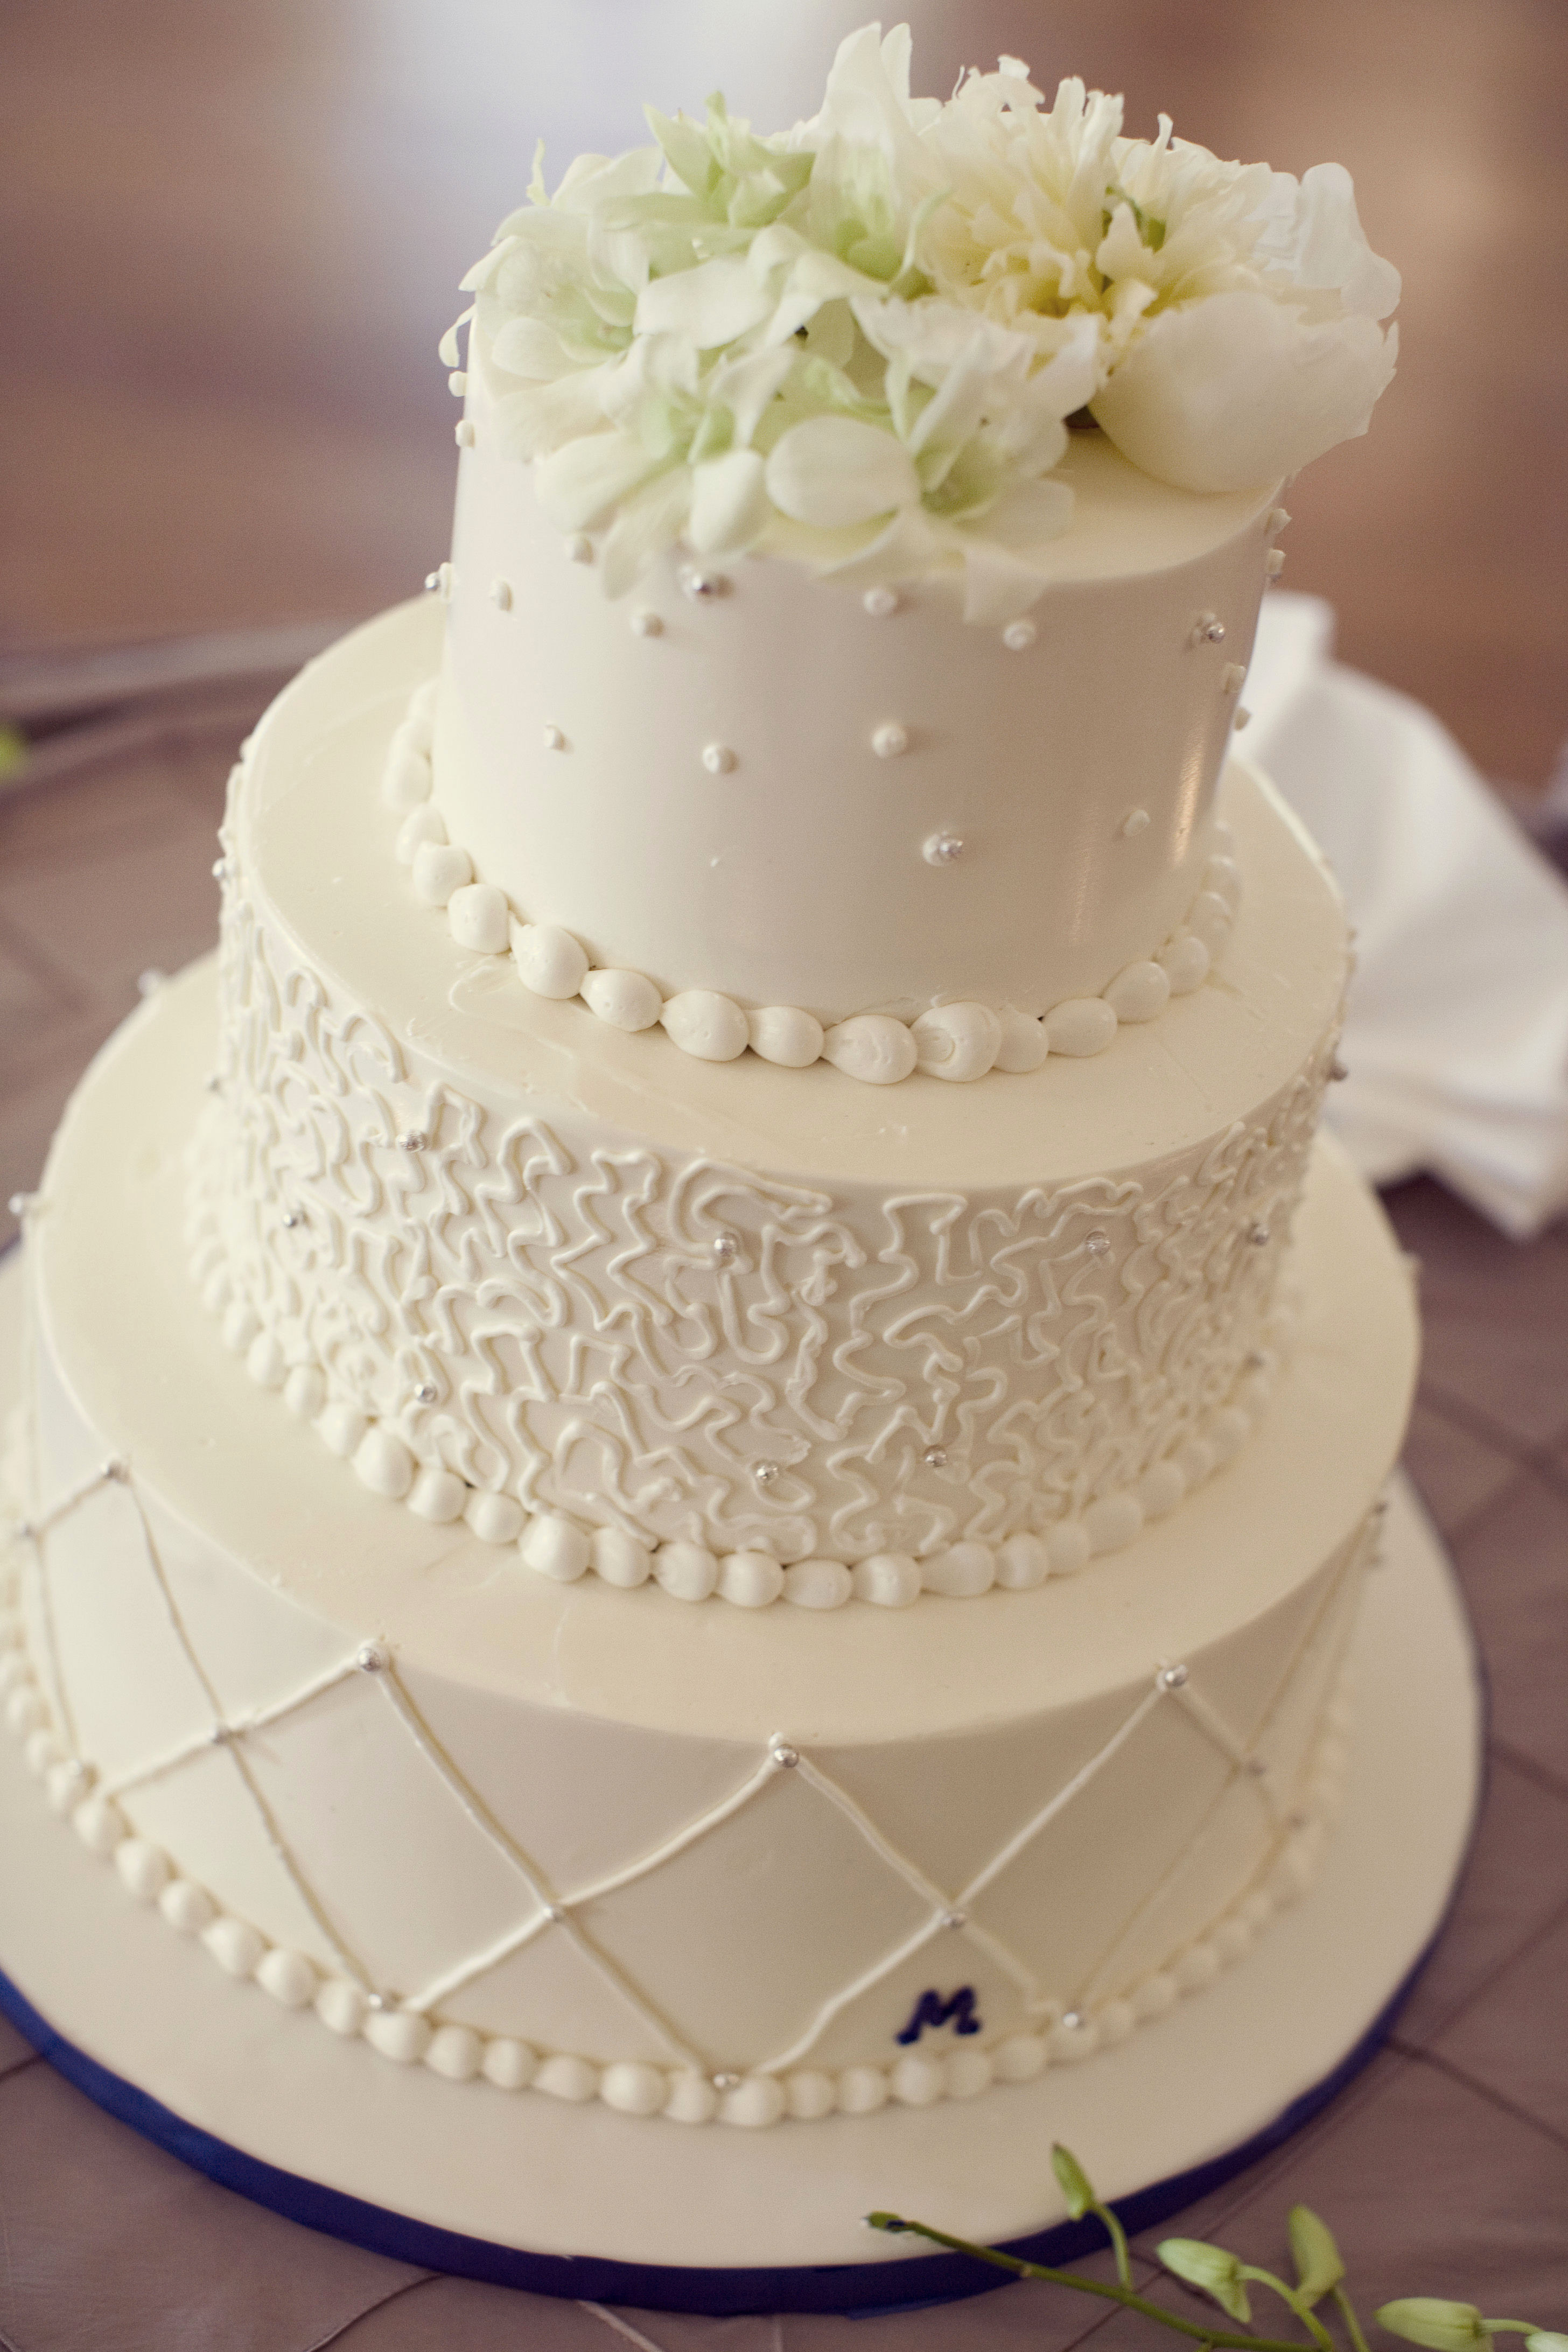 Icing For Wedding Cakes  Wedding Cake Icing Recipe